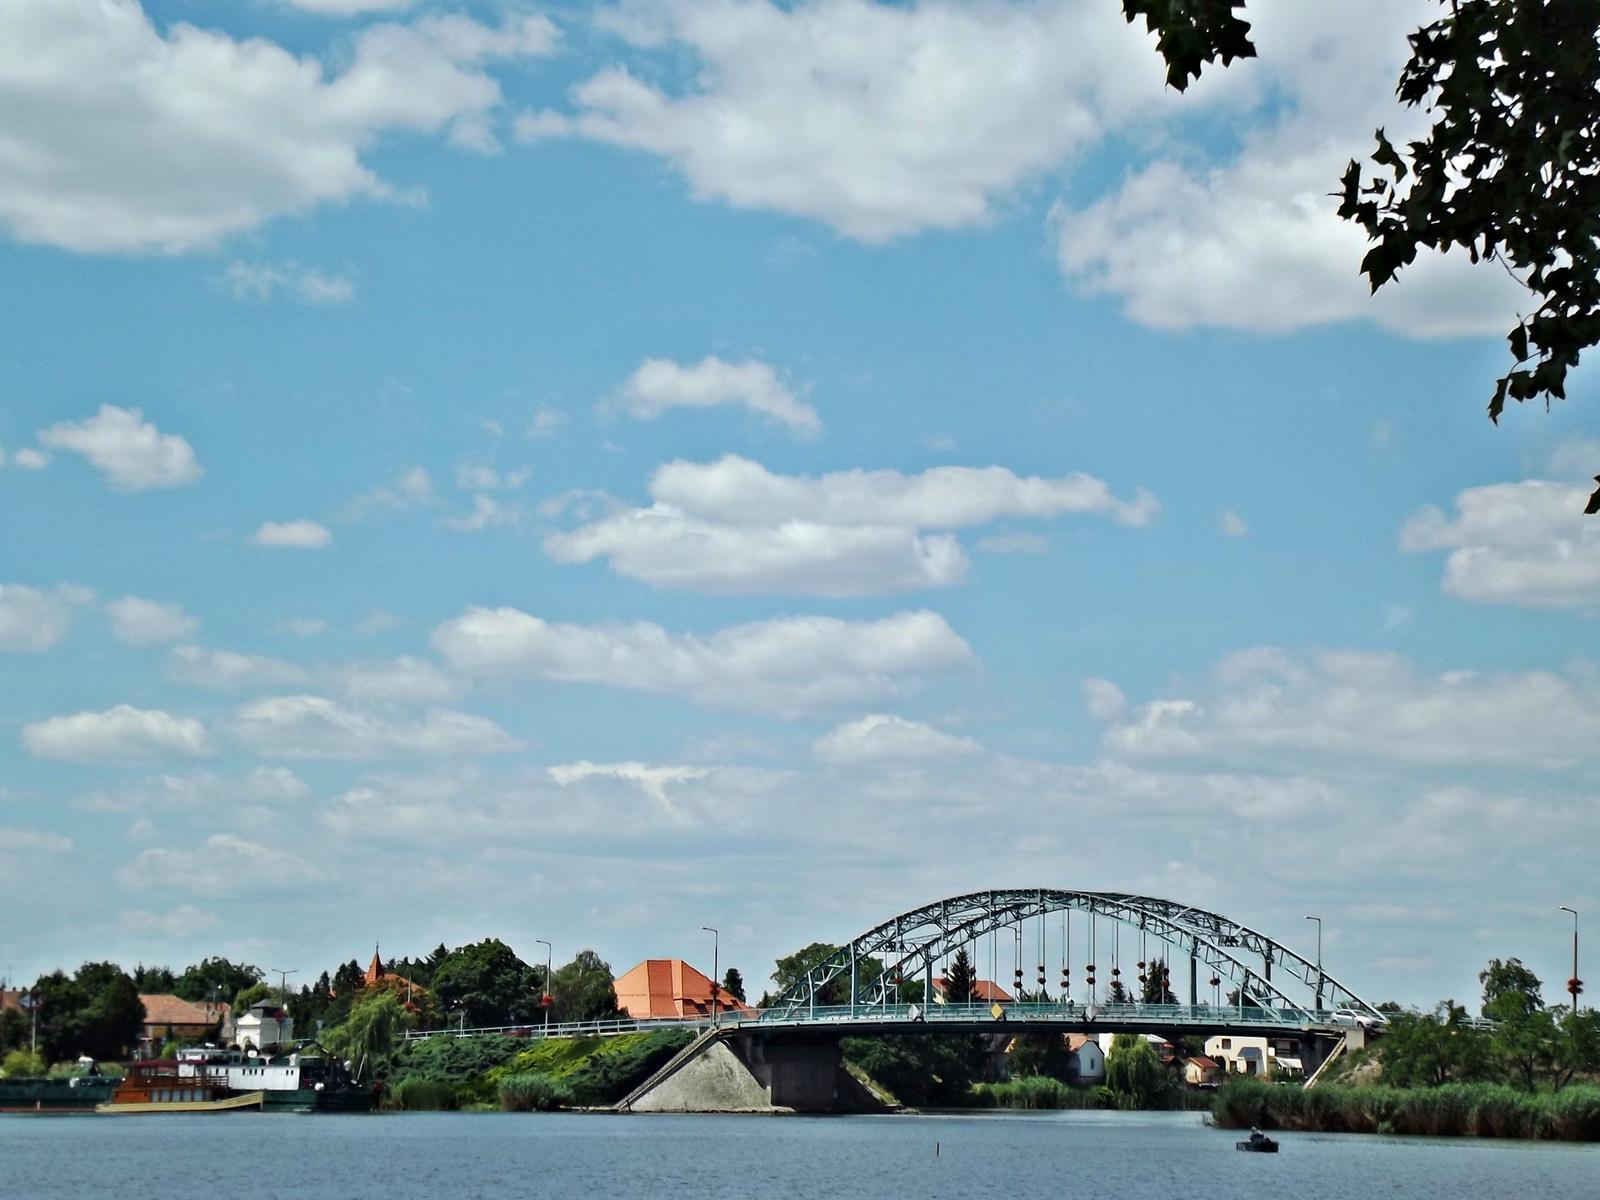 távolban a híd